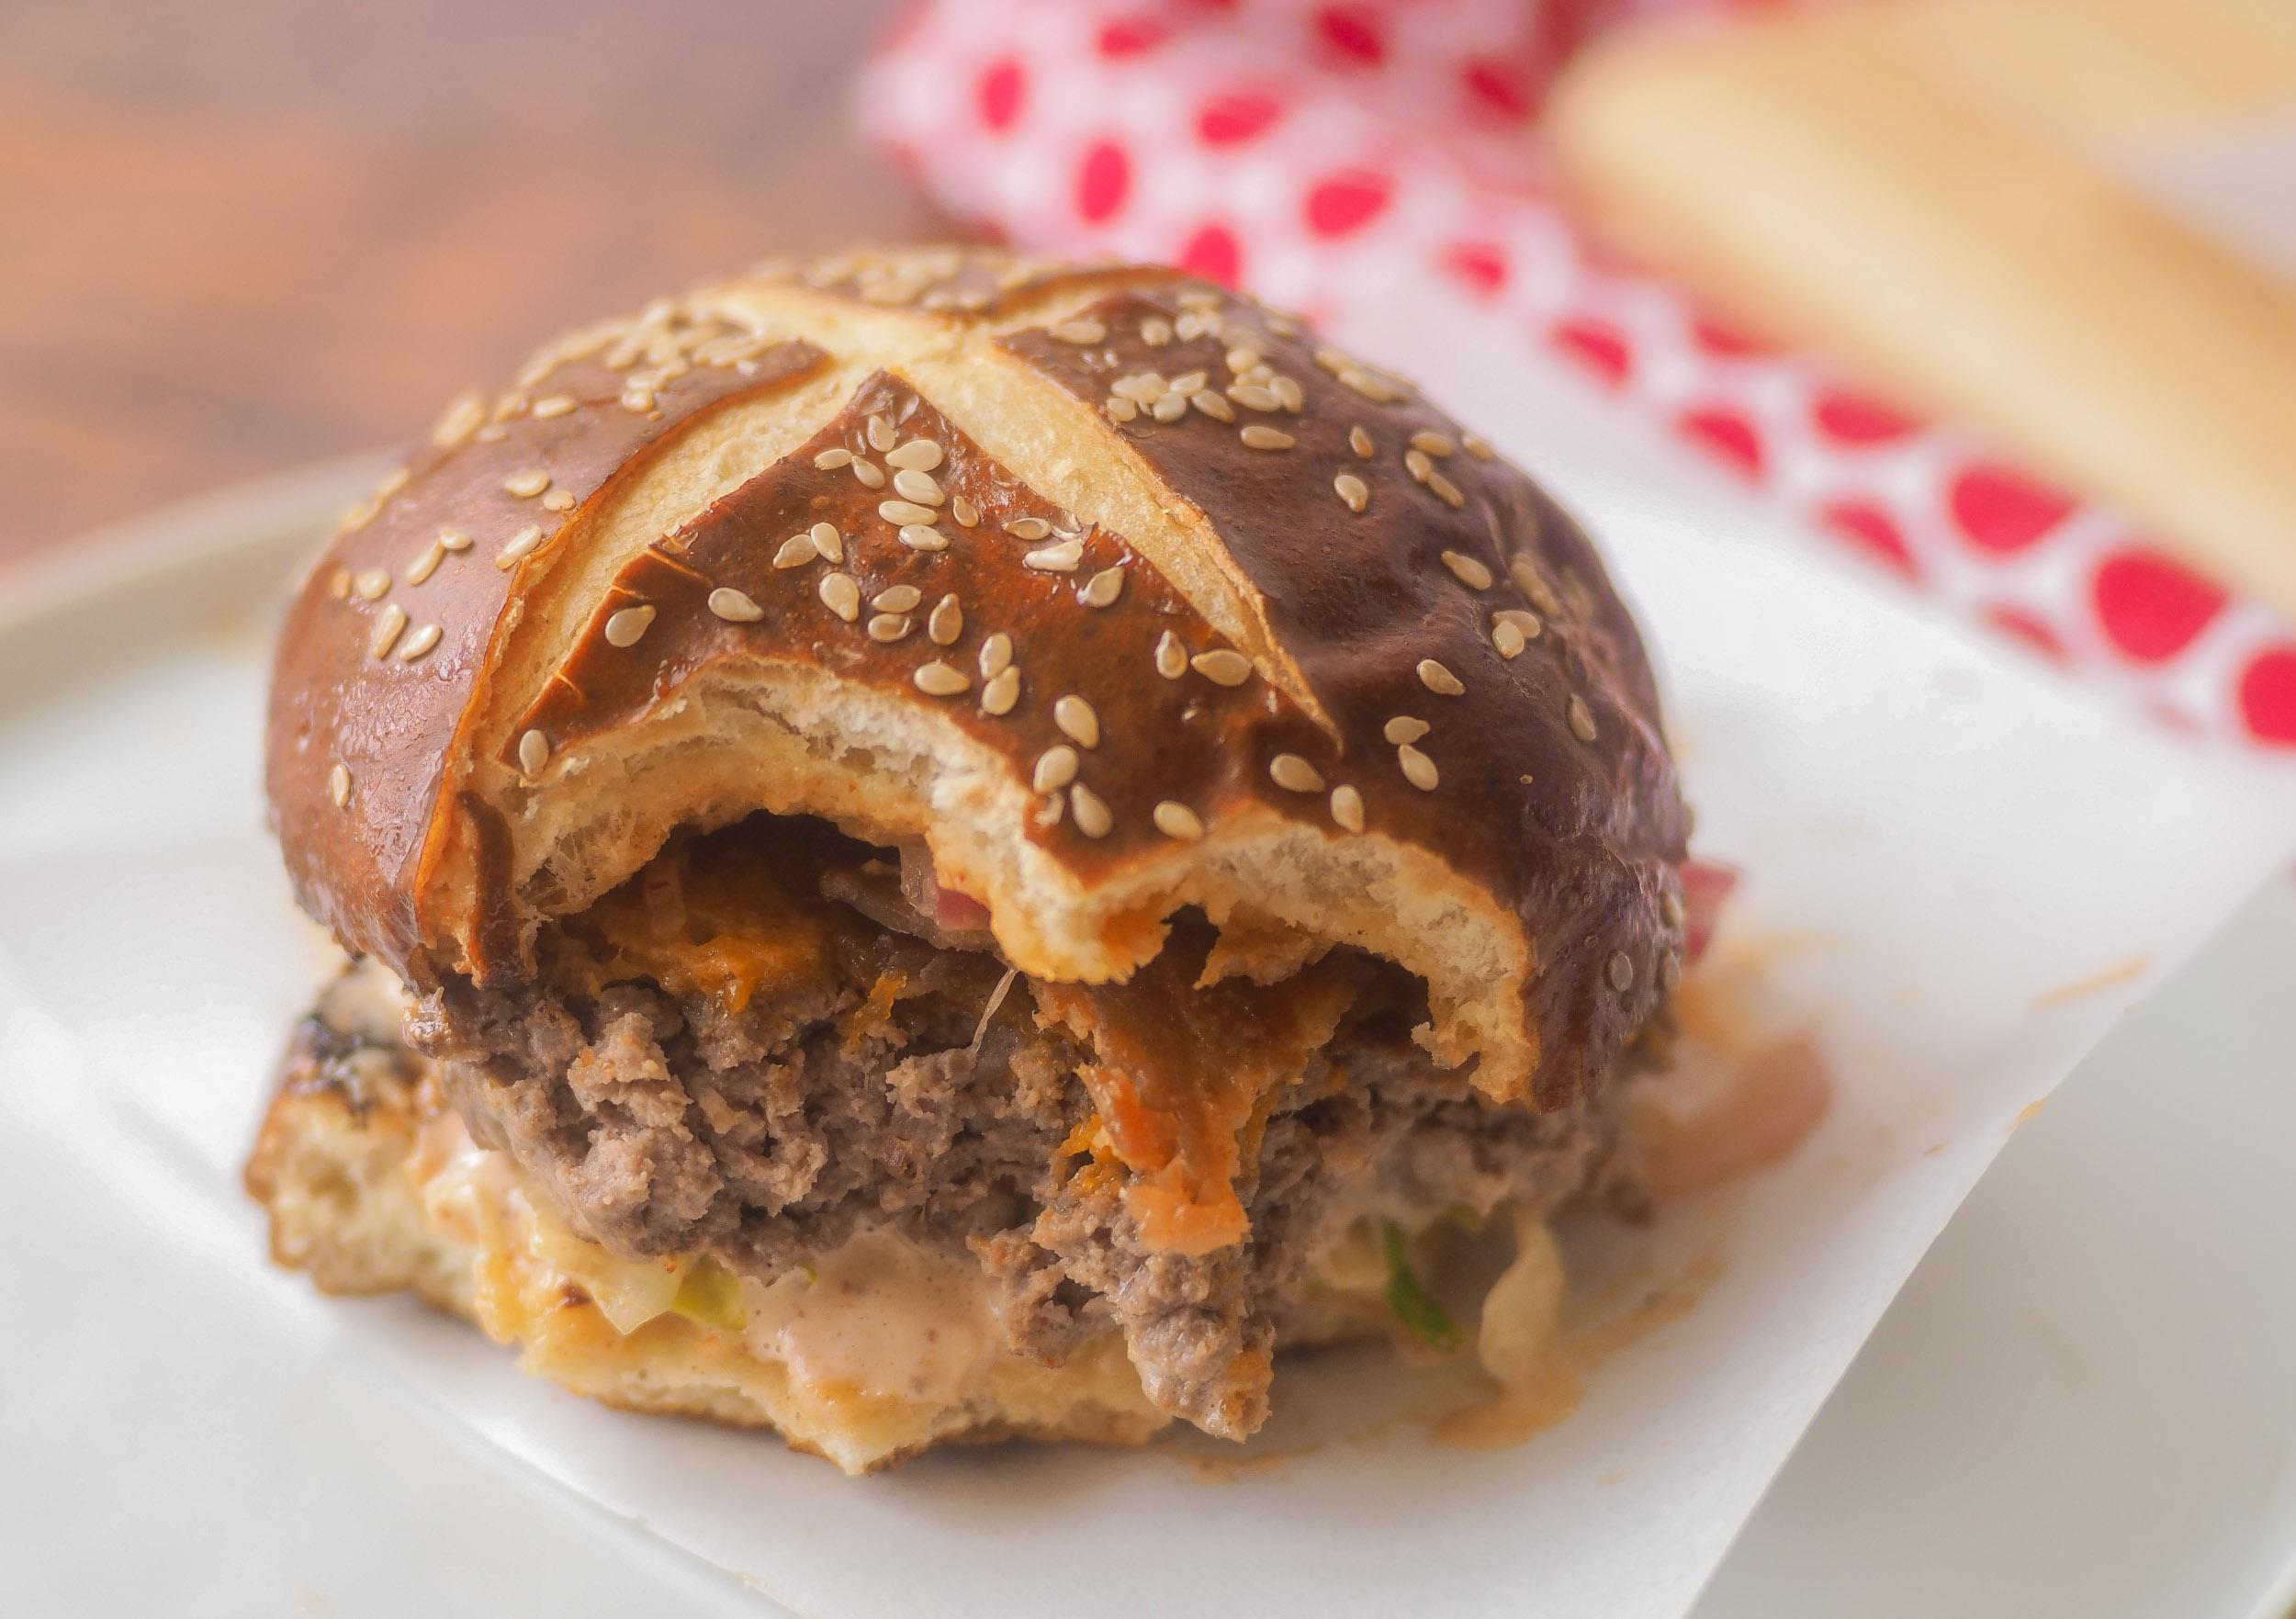 Insanity Burger